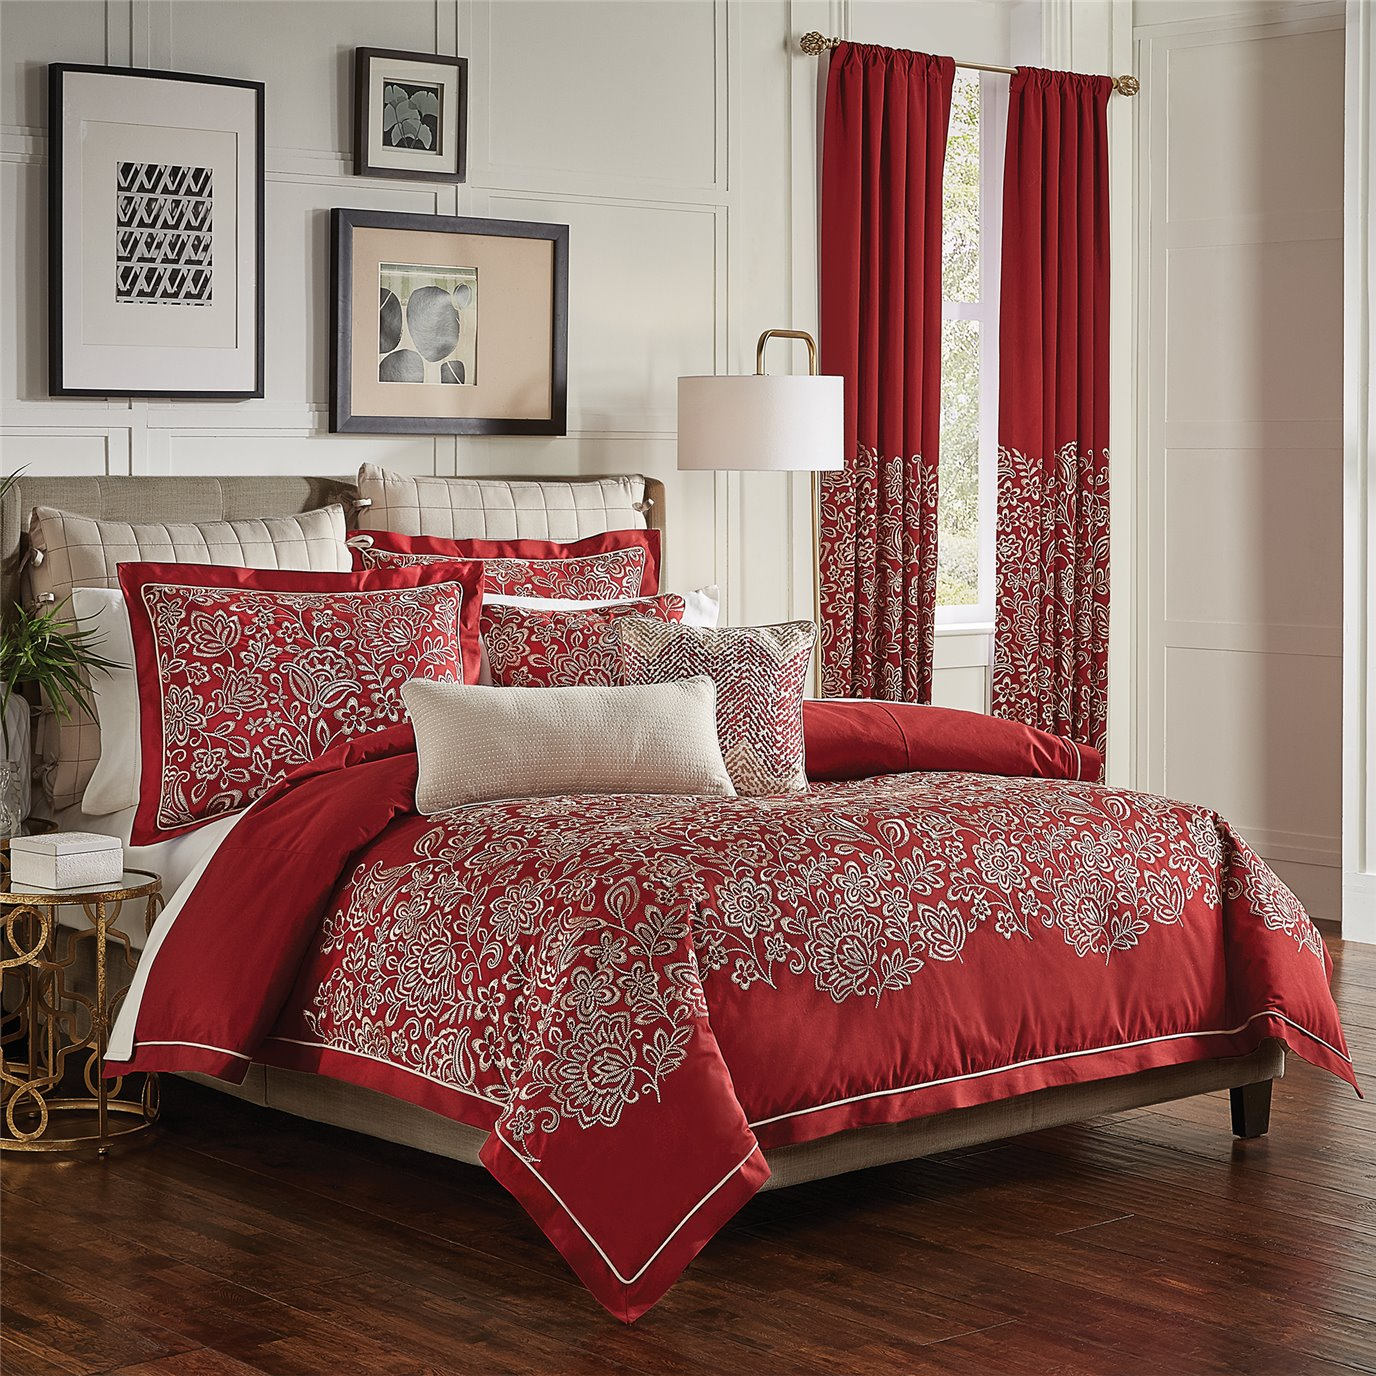 Adriel King 3 Piece Comforter set